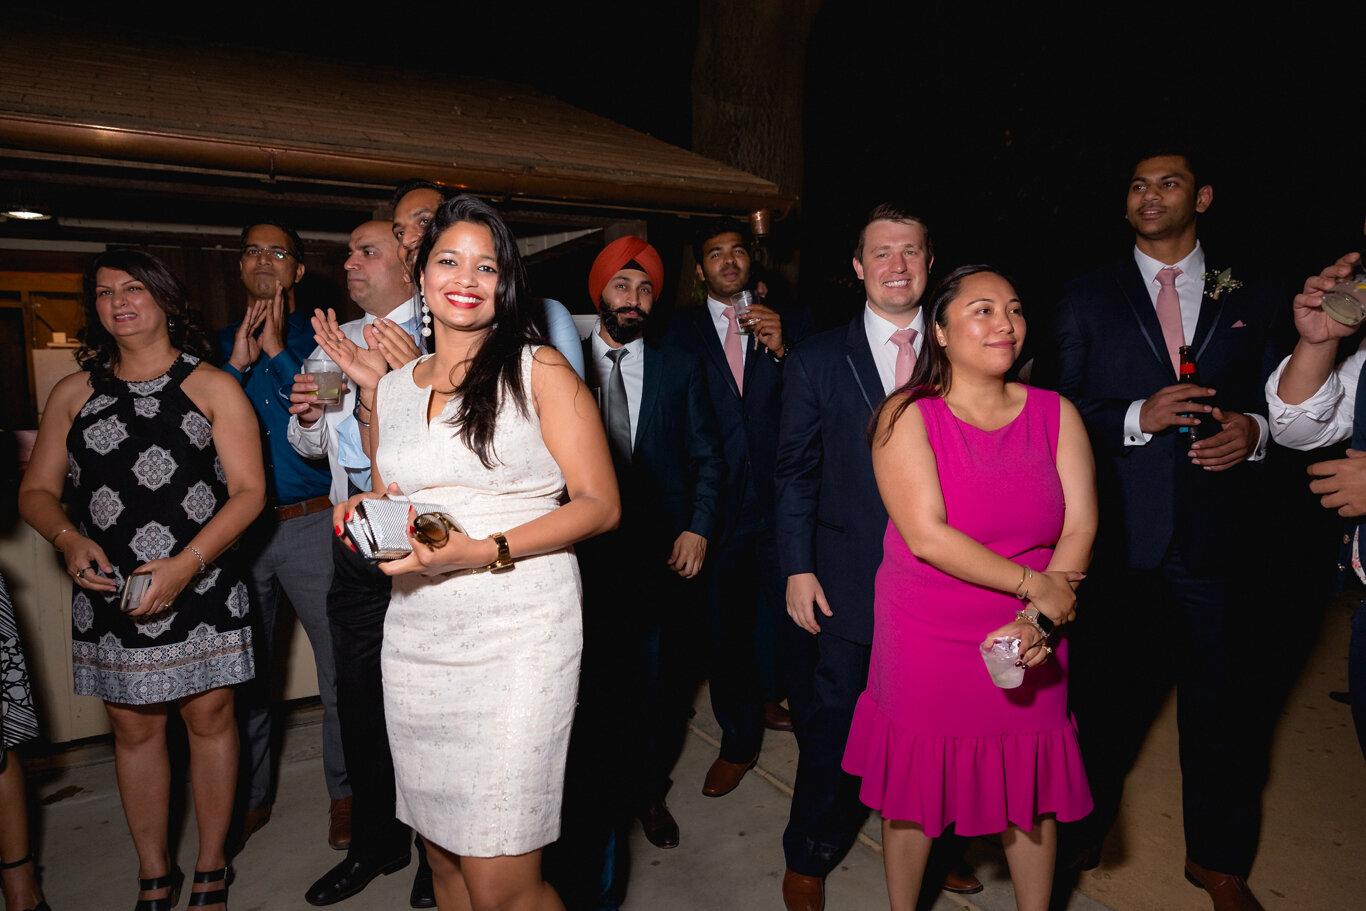 2019.08.24_Emily-Ashir-Wedding-at-the-Maples-6521.jpg